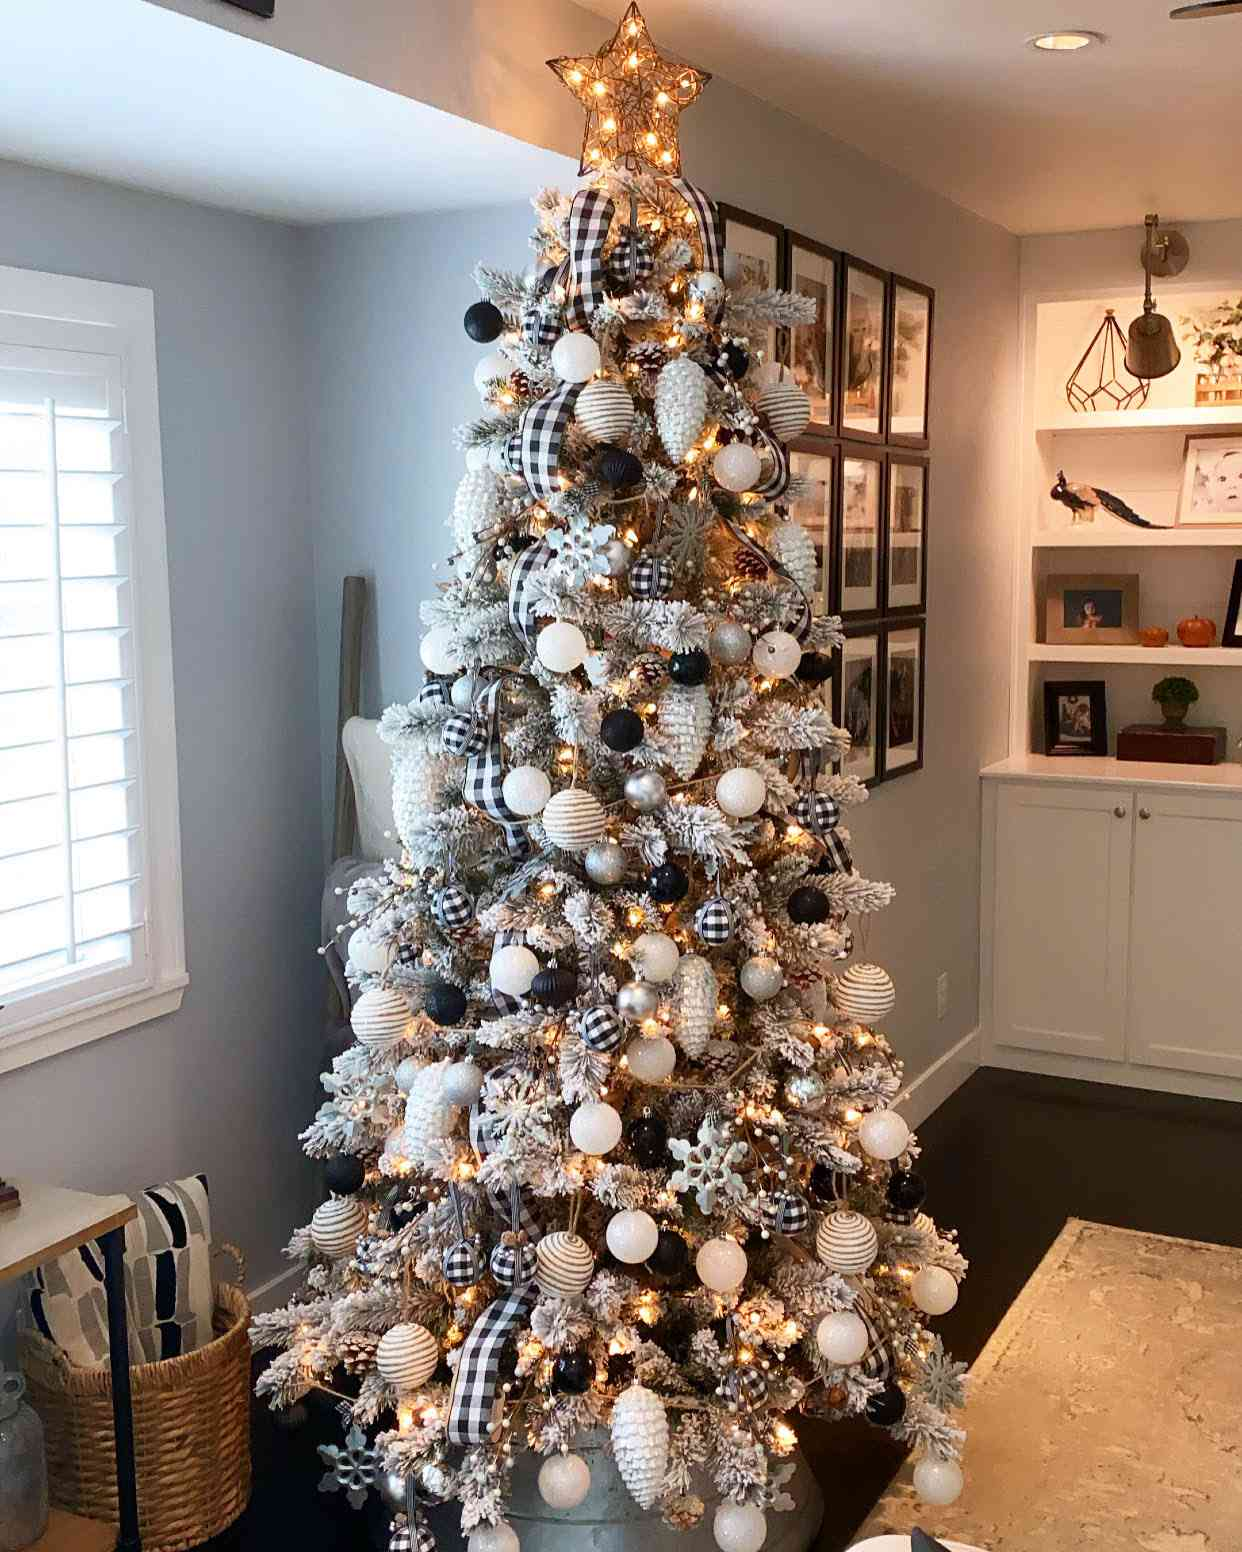 Meg Peacock's buffalo plaid Christmas tree